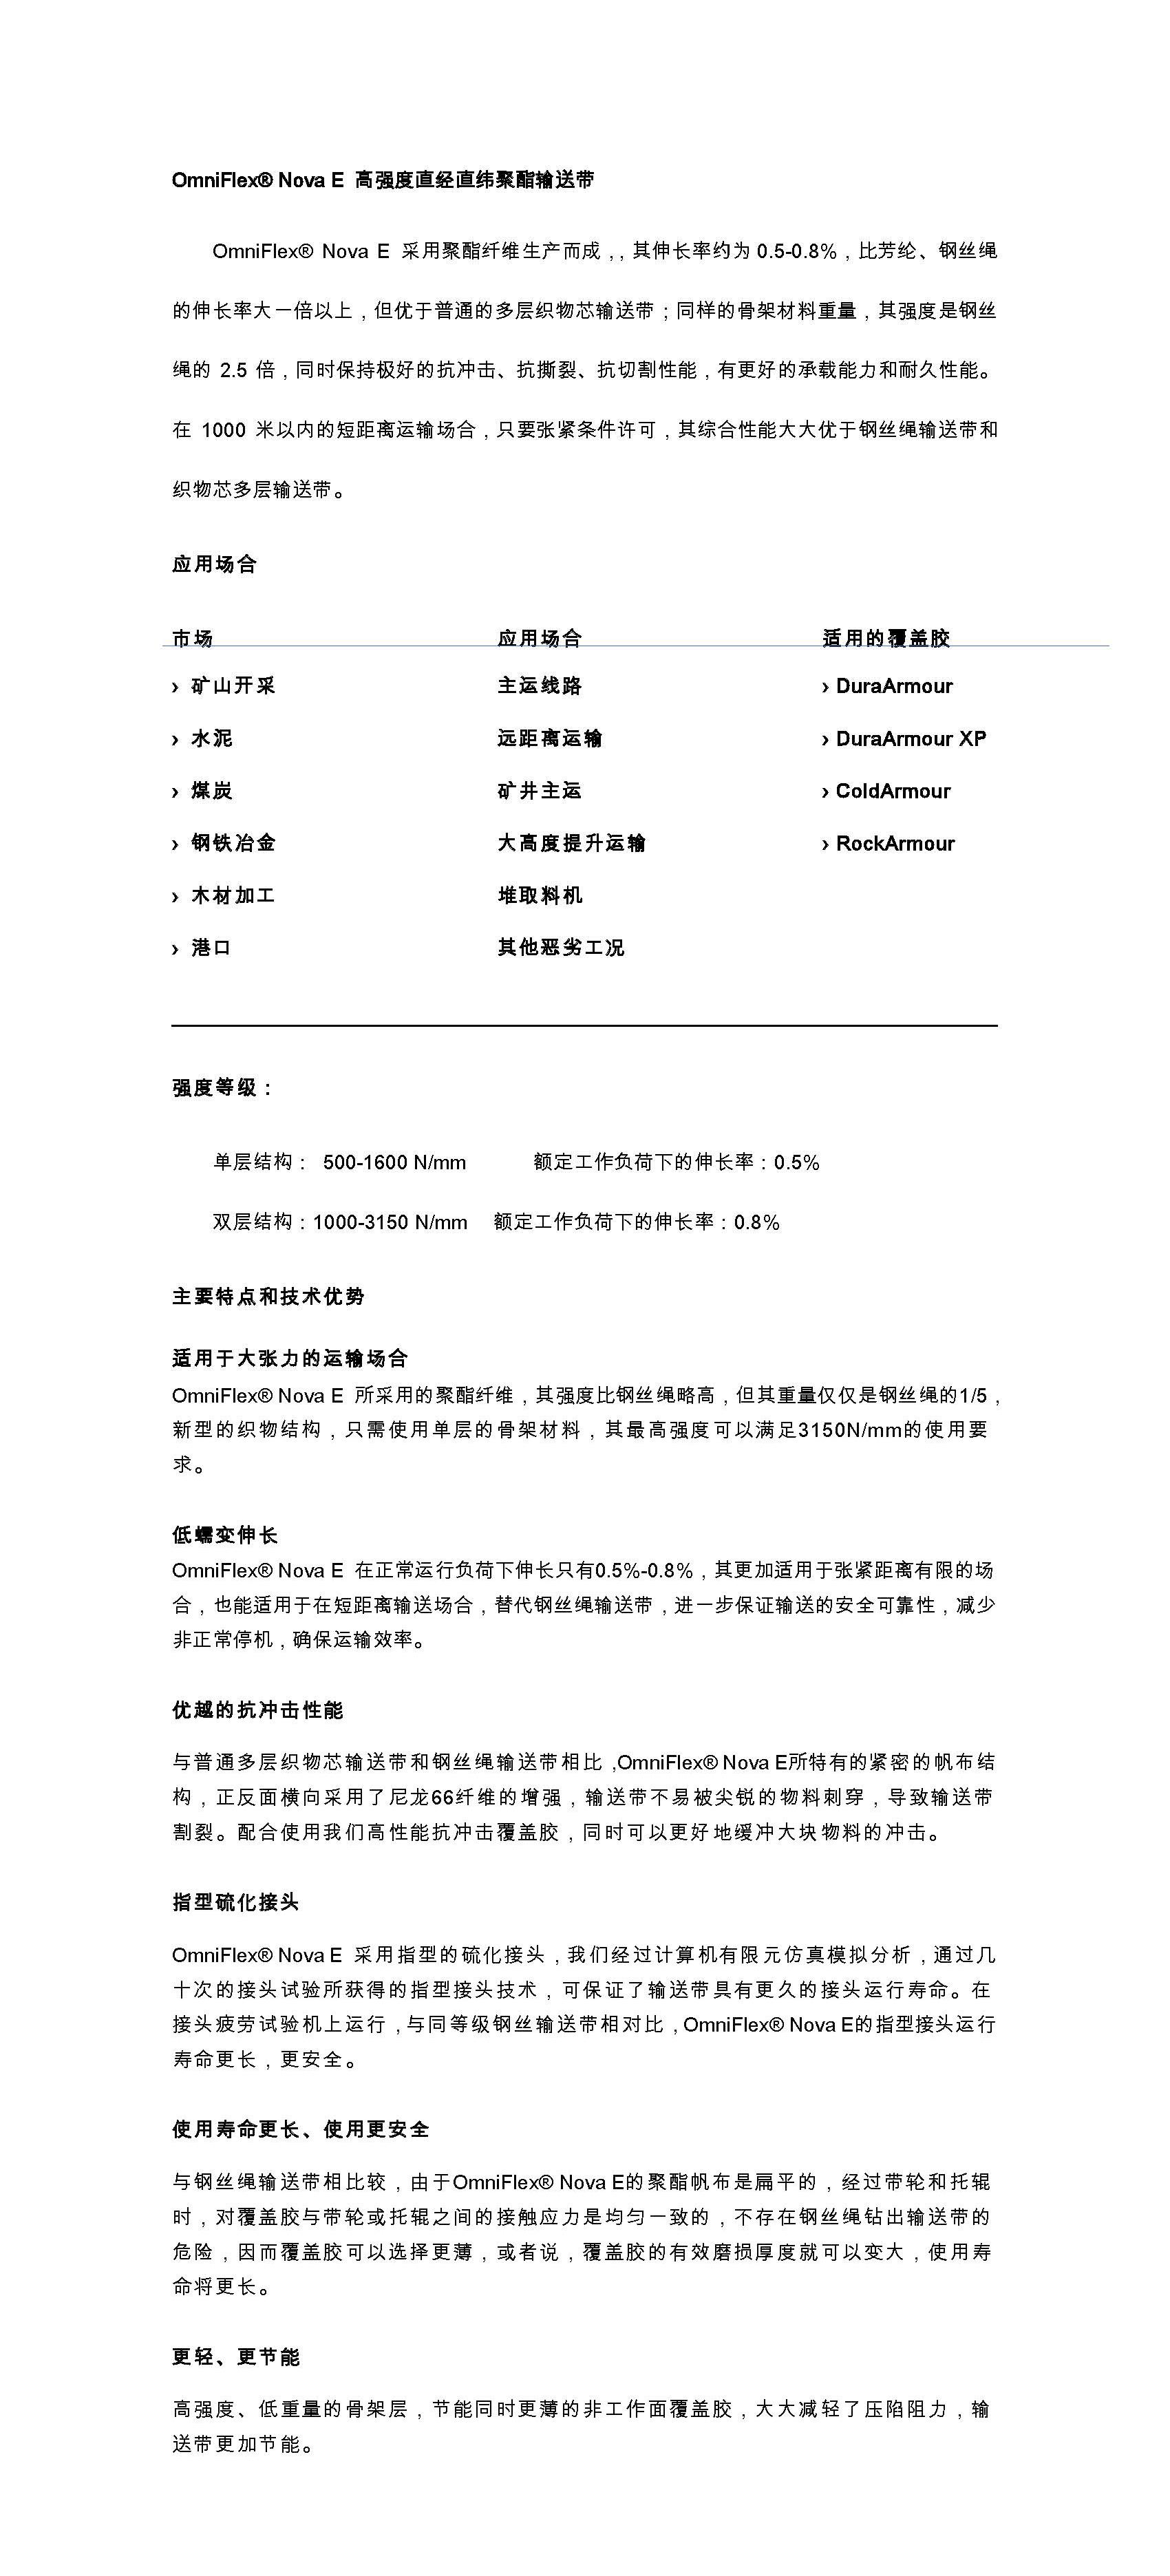 OmniFlexNovaE-中文合